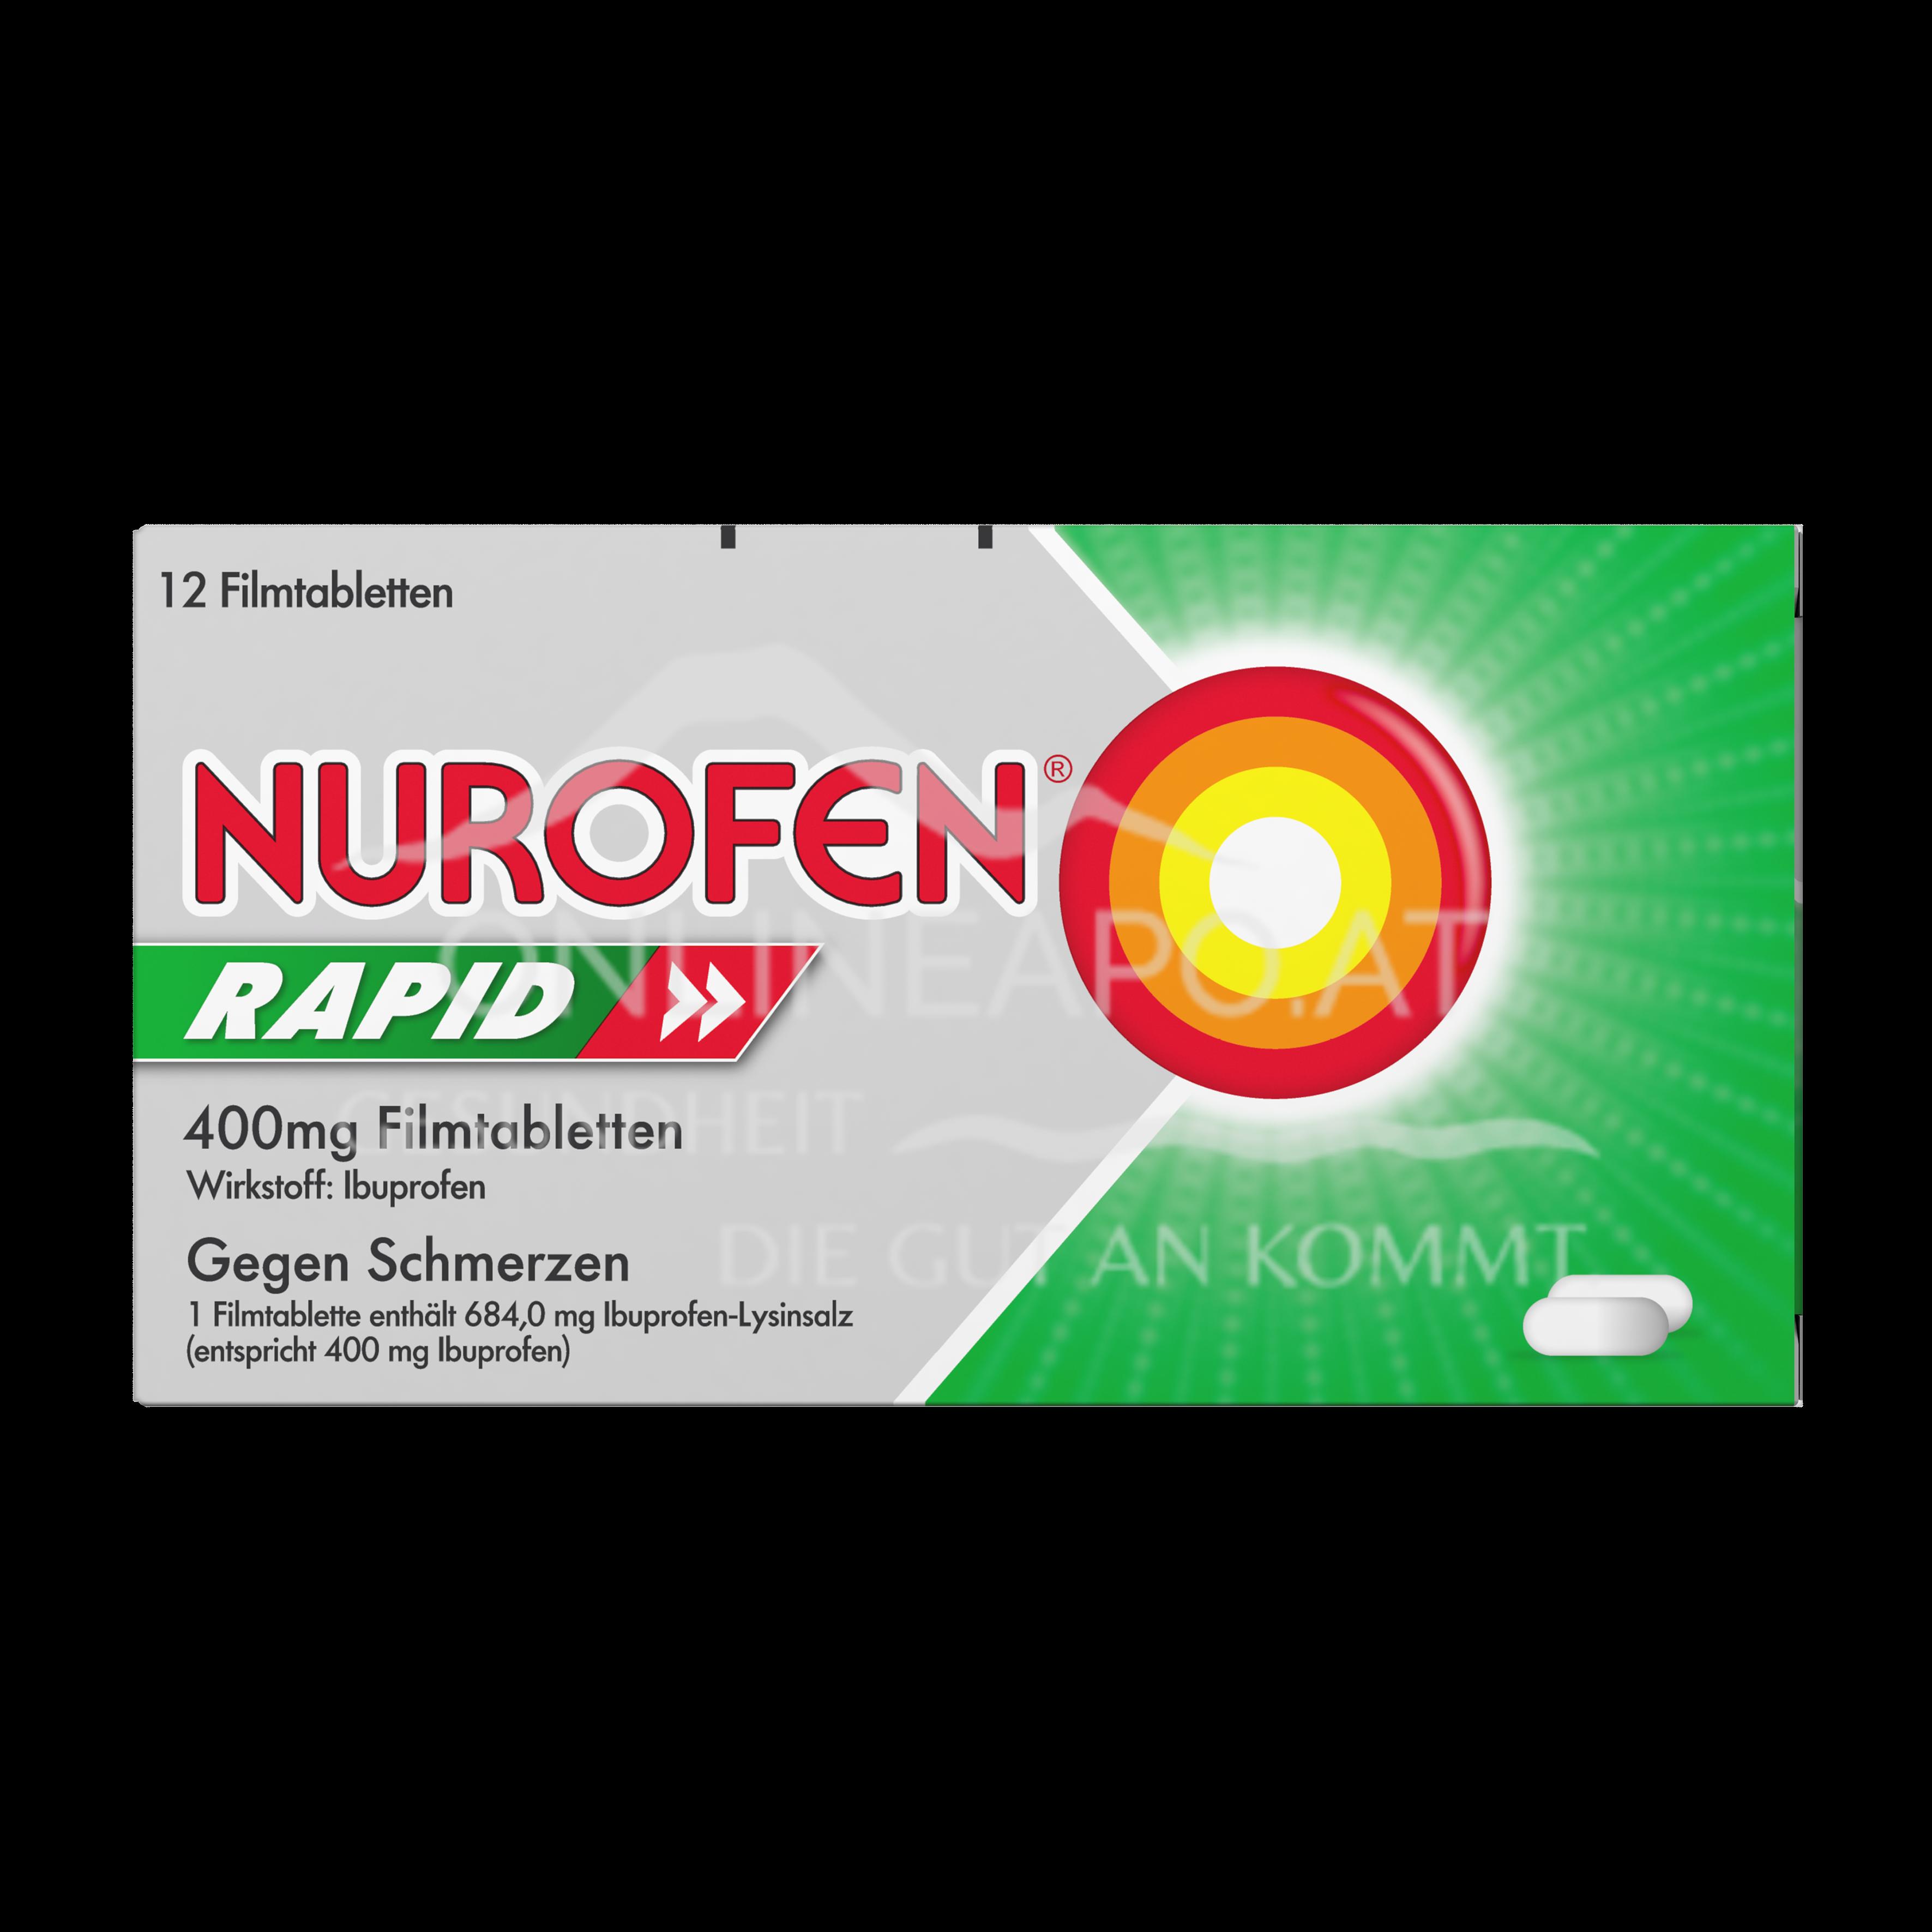 Nurofen® Rapid 400mg Filmtabletten